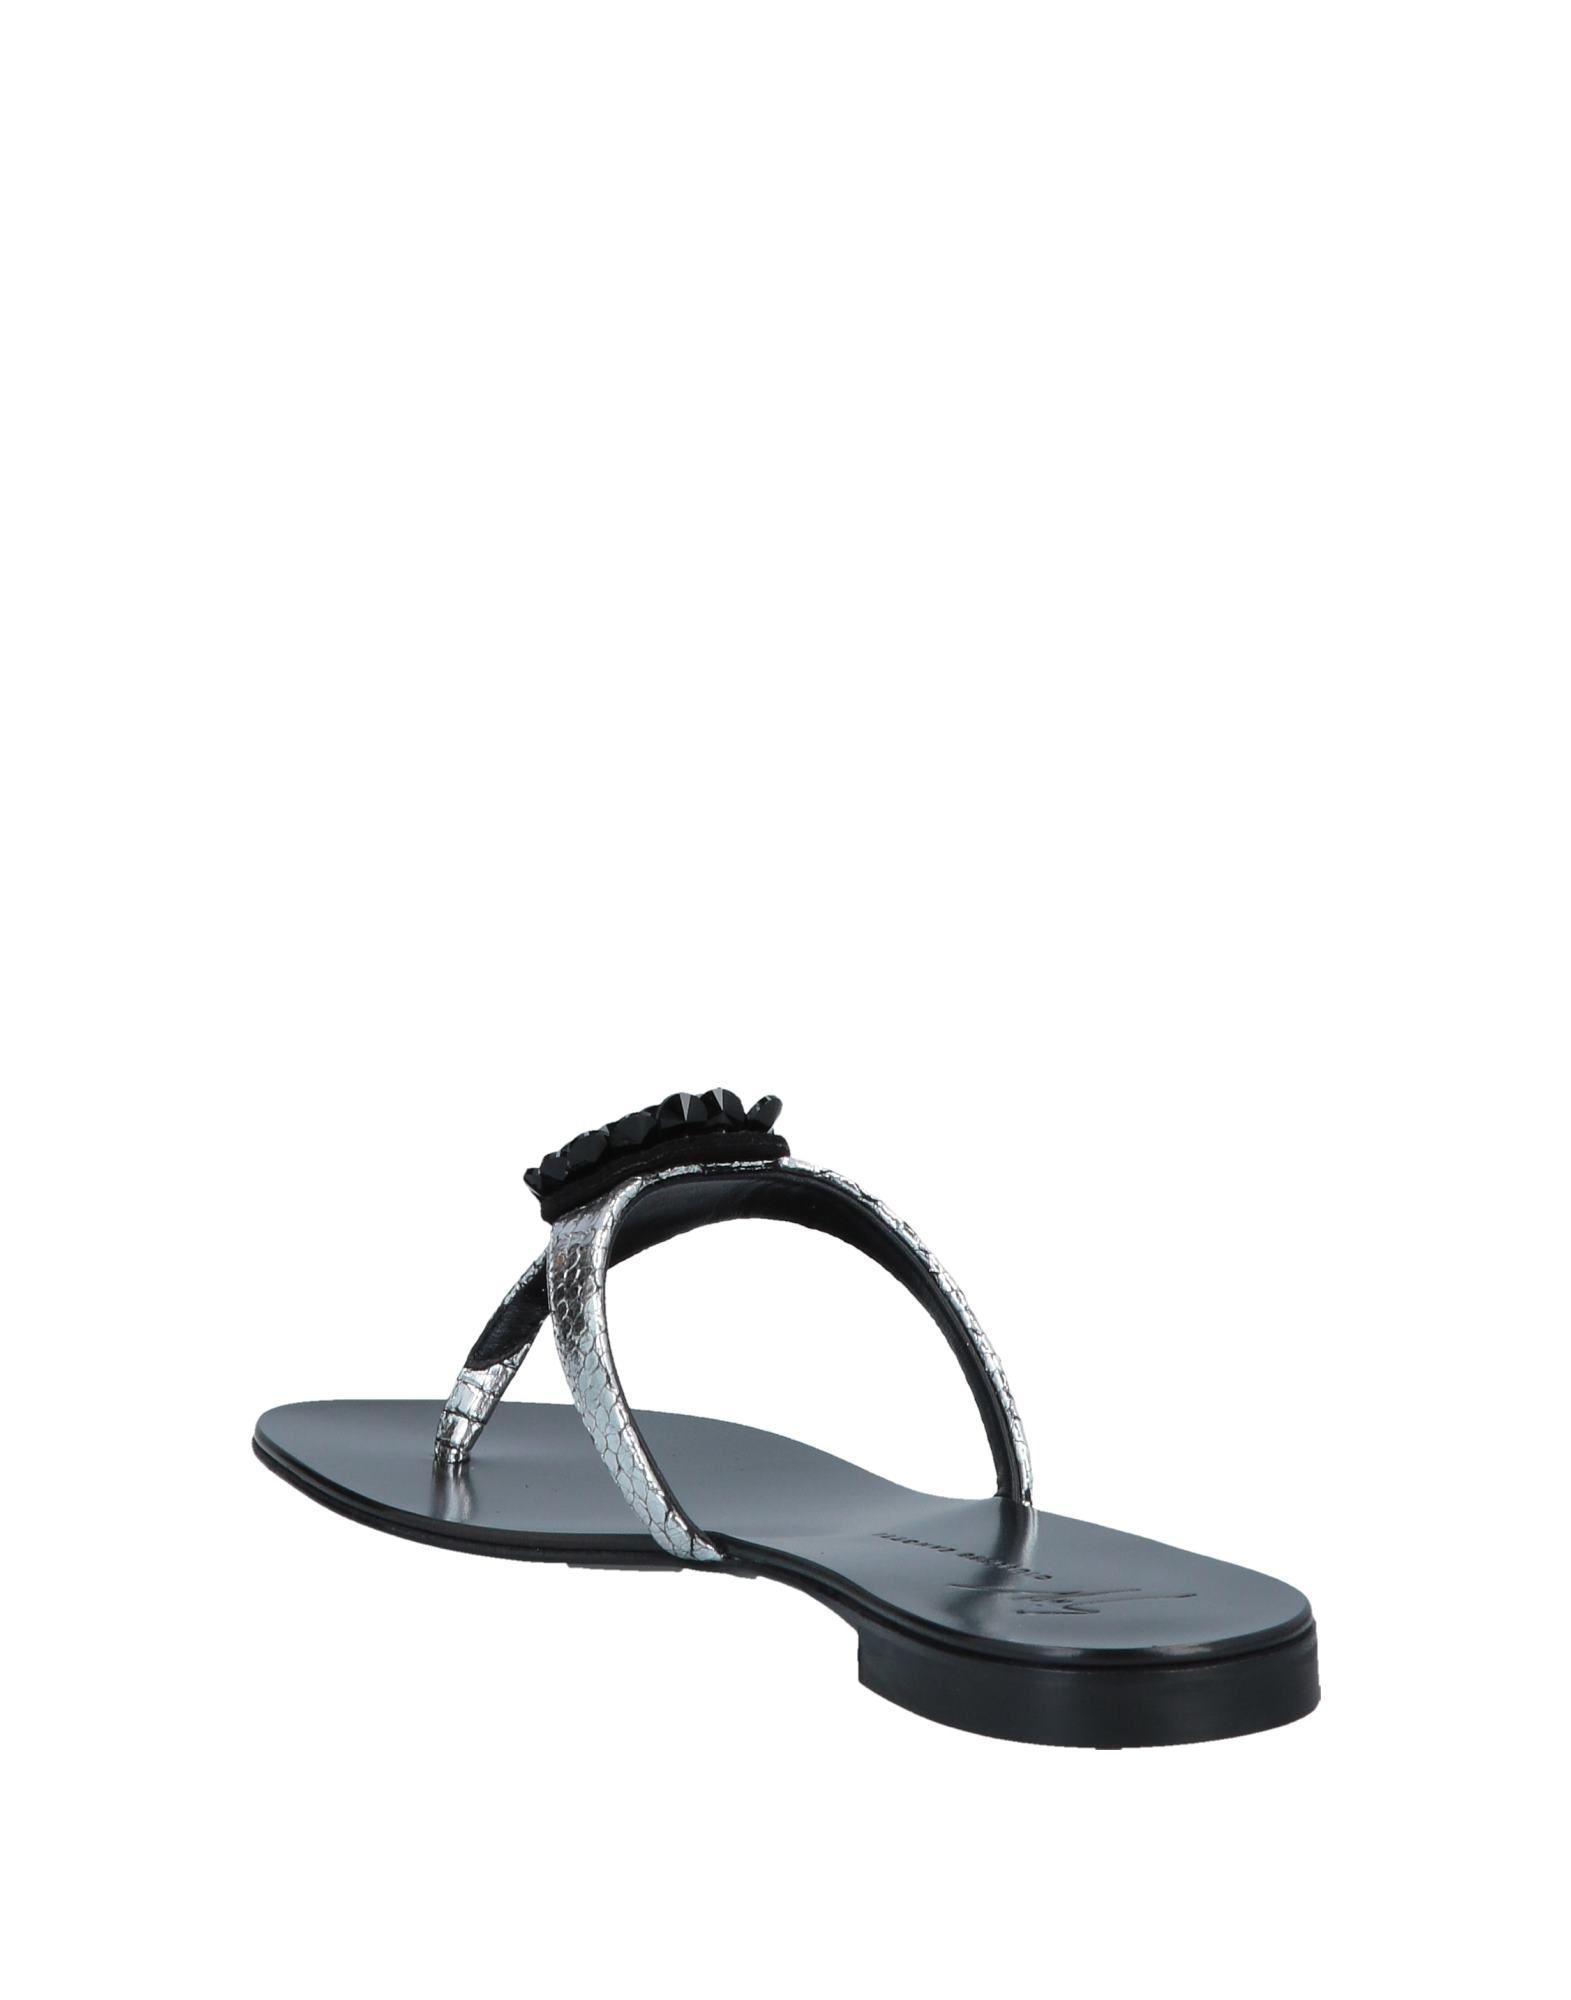 aebebb967be3e8 Lyst - Giuseppe Zanotti Toe Post Sandal in Metallic